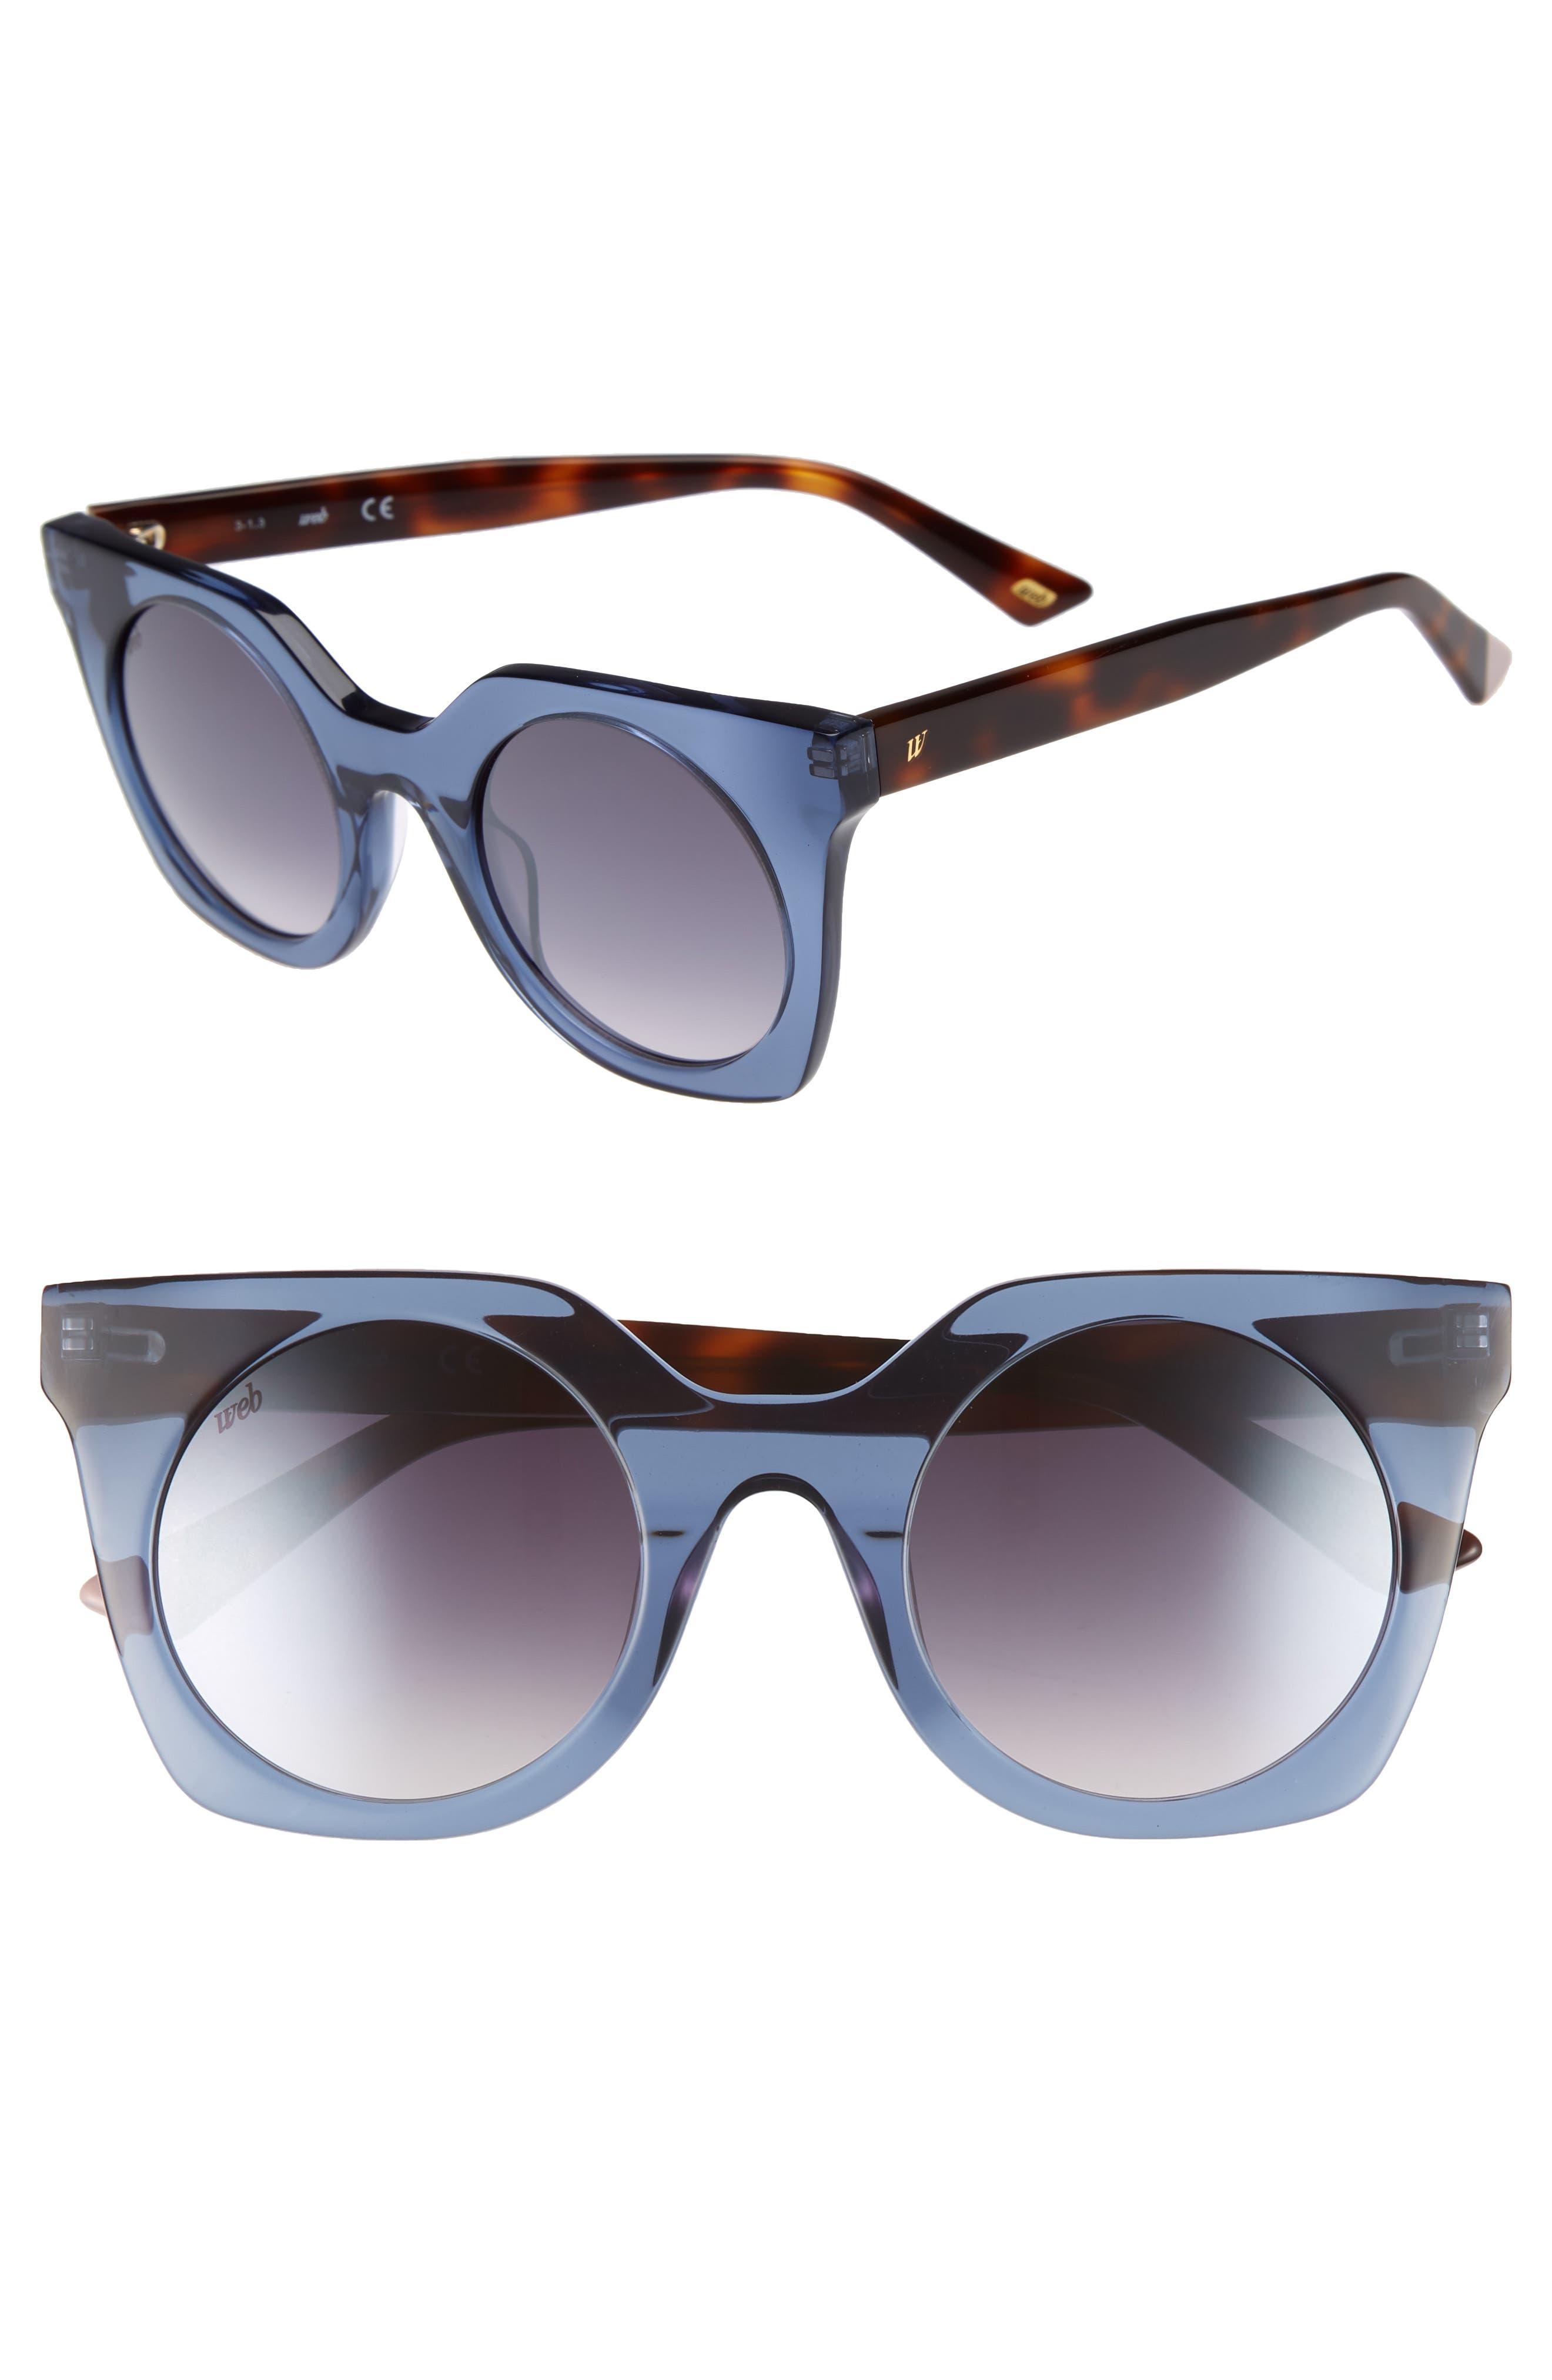 48mm Sunglasses,                             Main thumbnail 1, color,                             Shiny Blue/ Blue Mirror